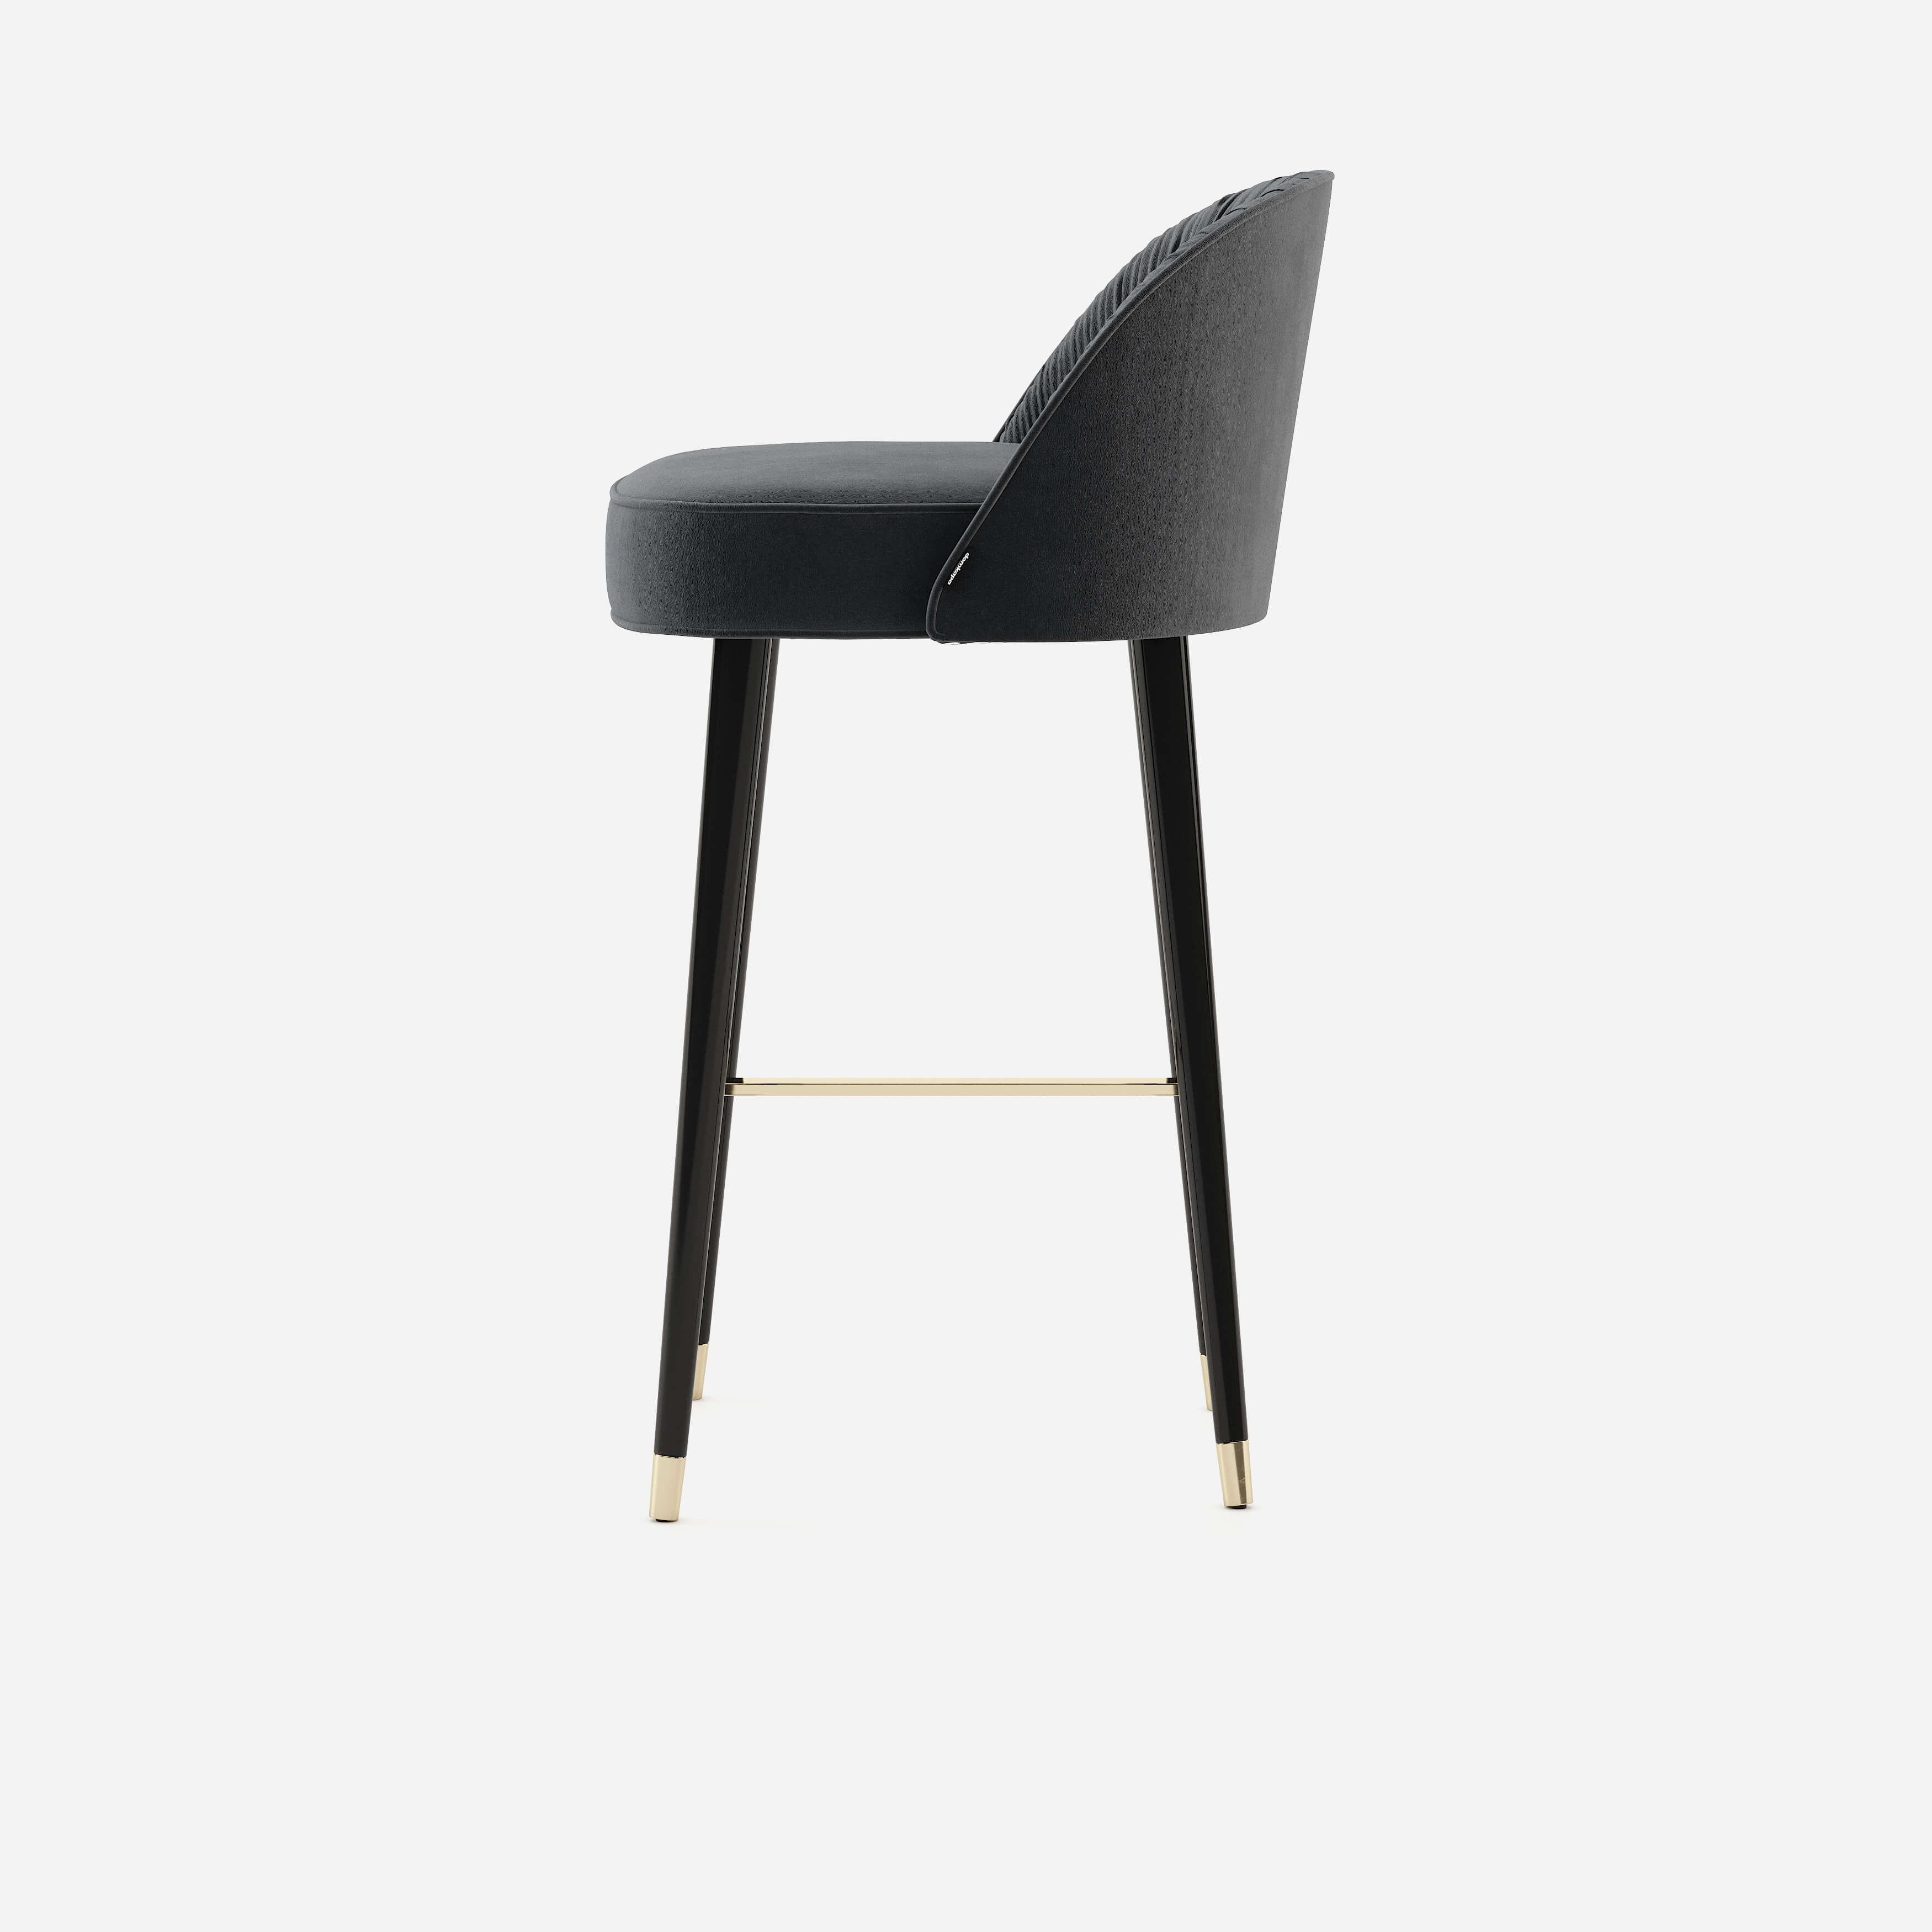 camille-cadeira-de-bar-domkapa-upholstery-velvet-contract-hospitality-hotal-design-projects-bar-chair-3